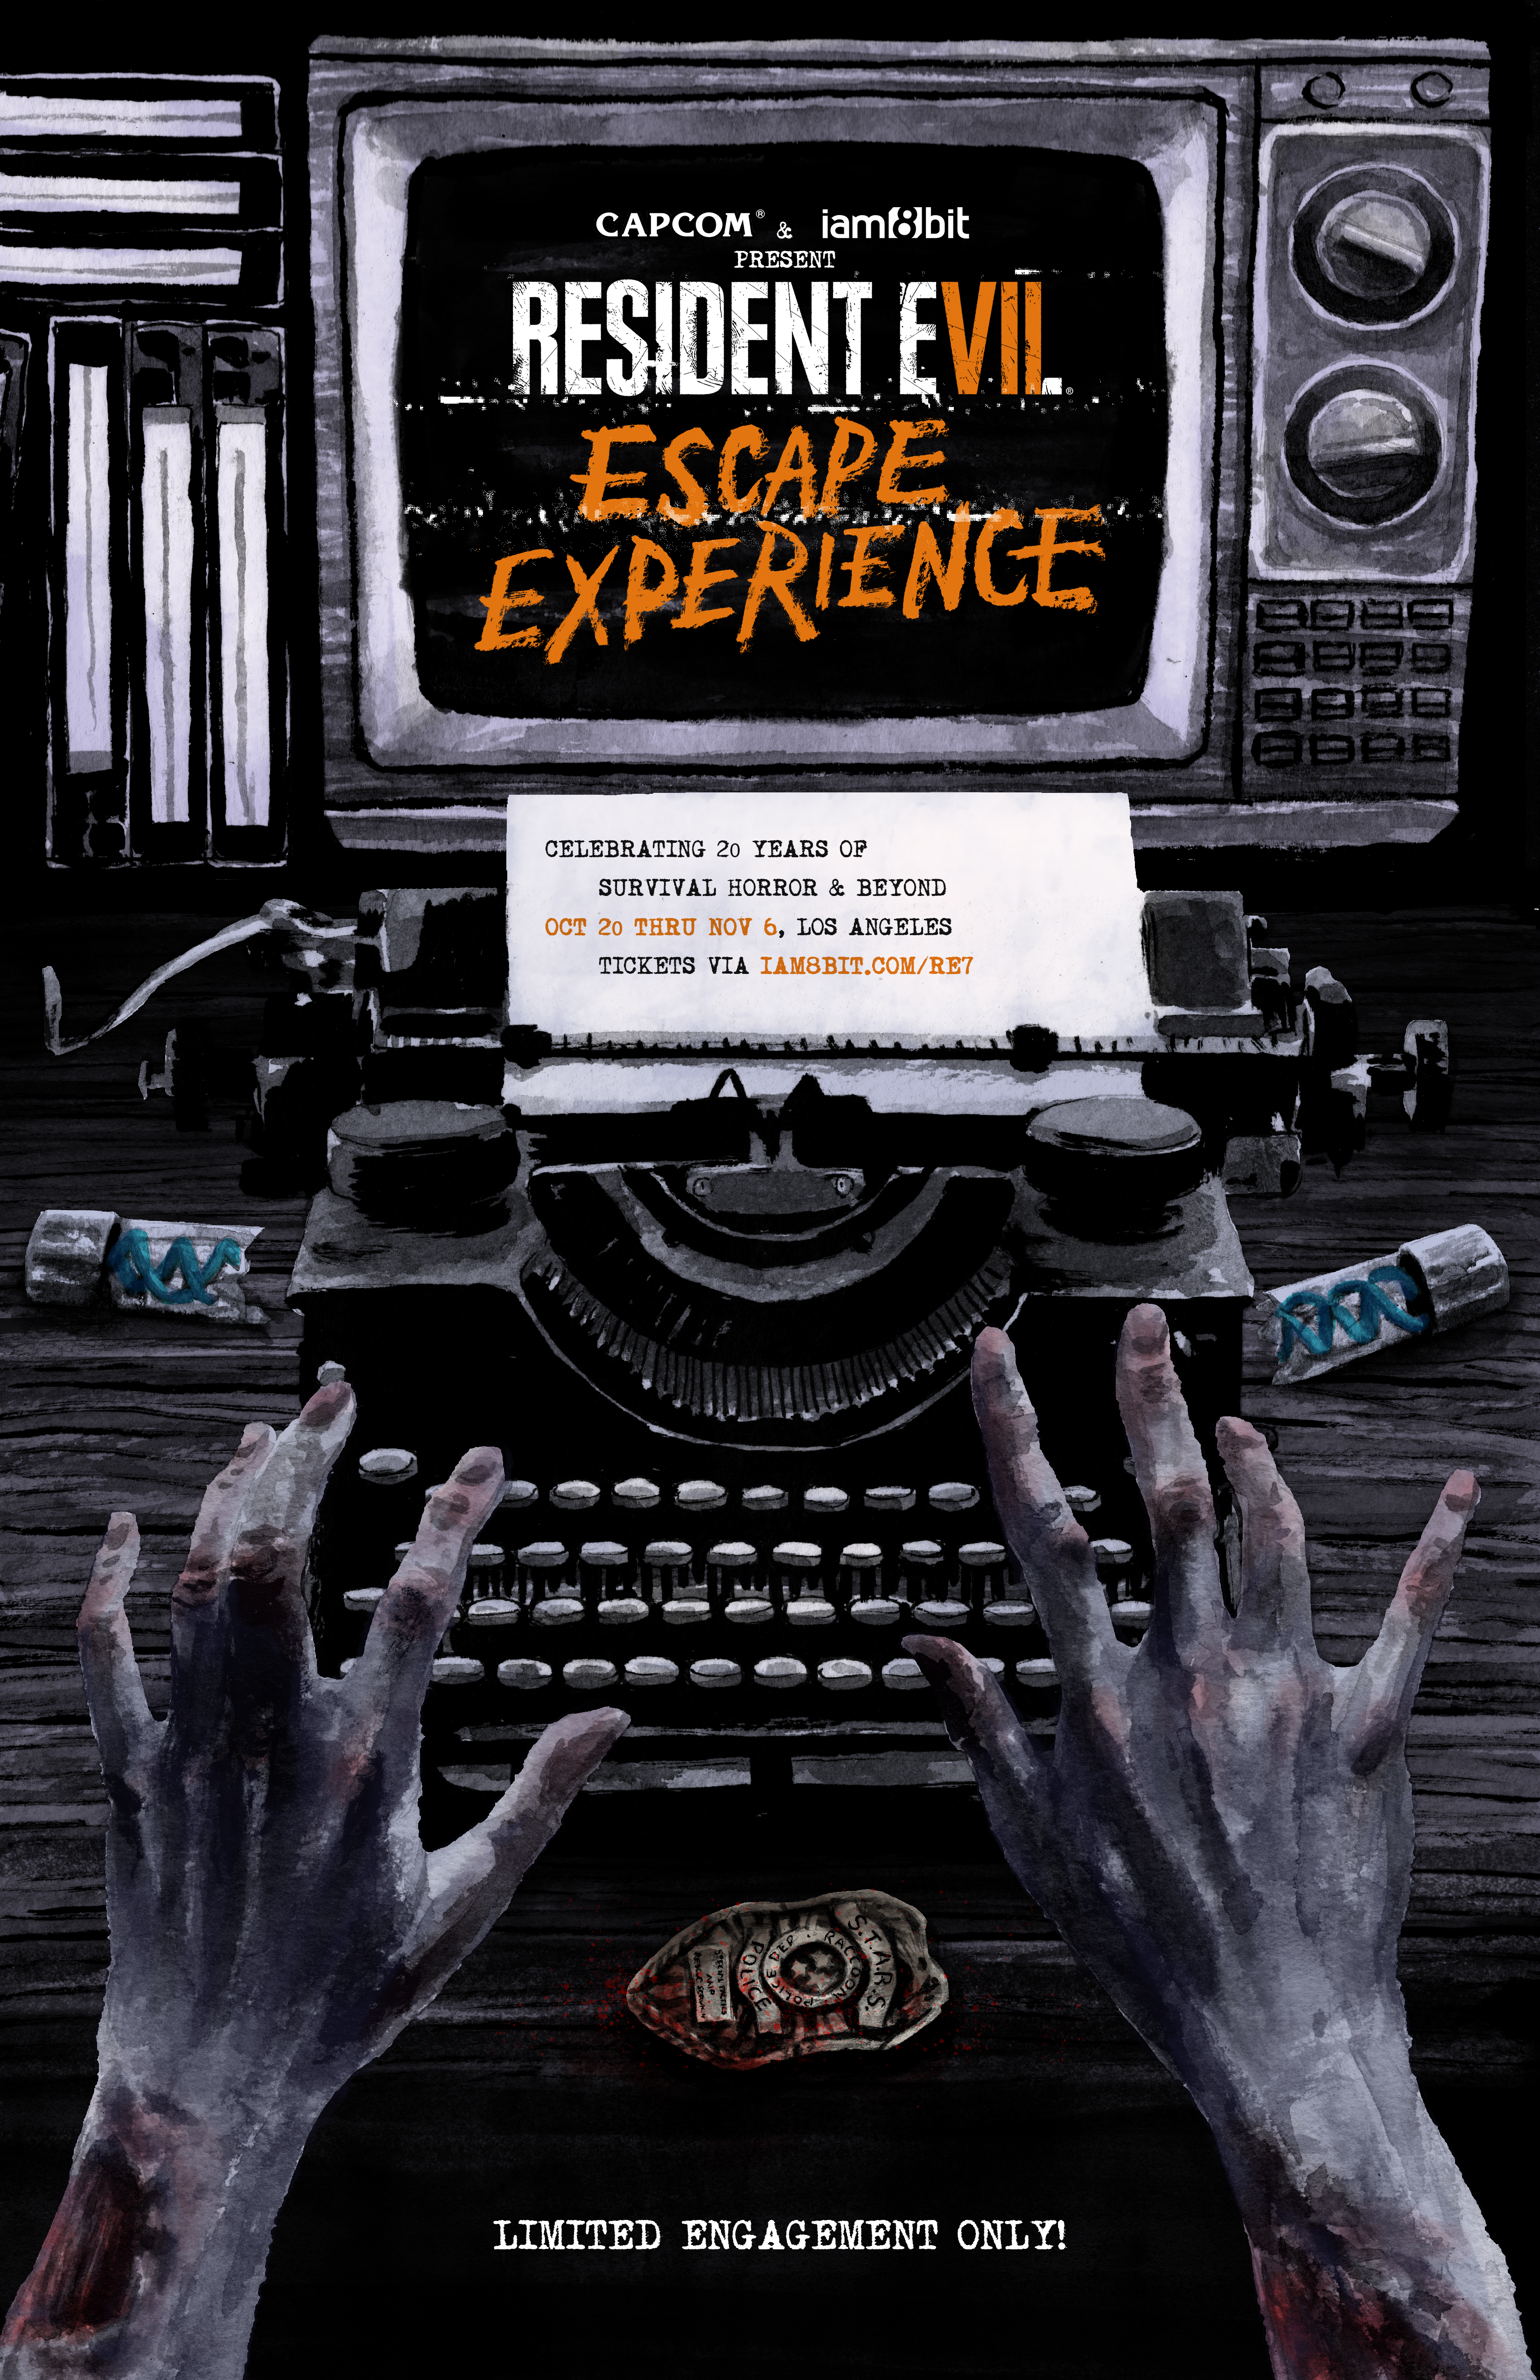 RE VII: Escape Experience